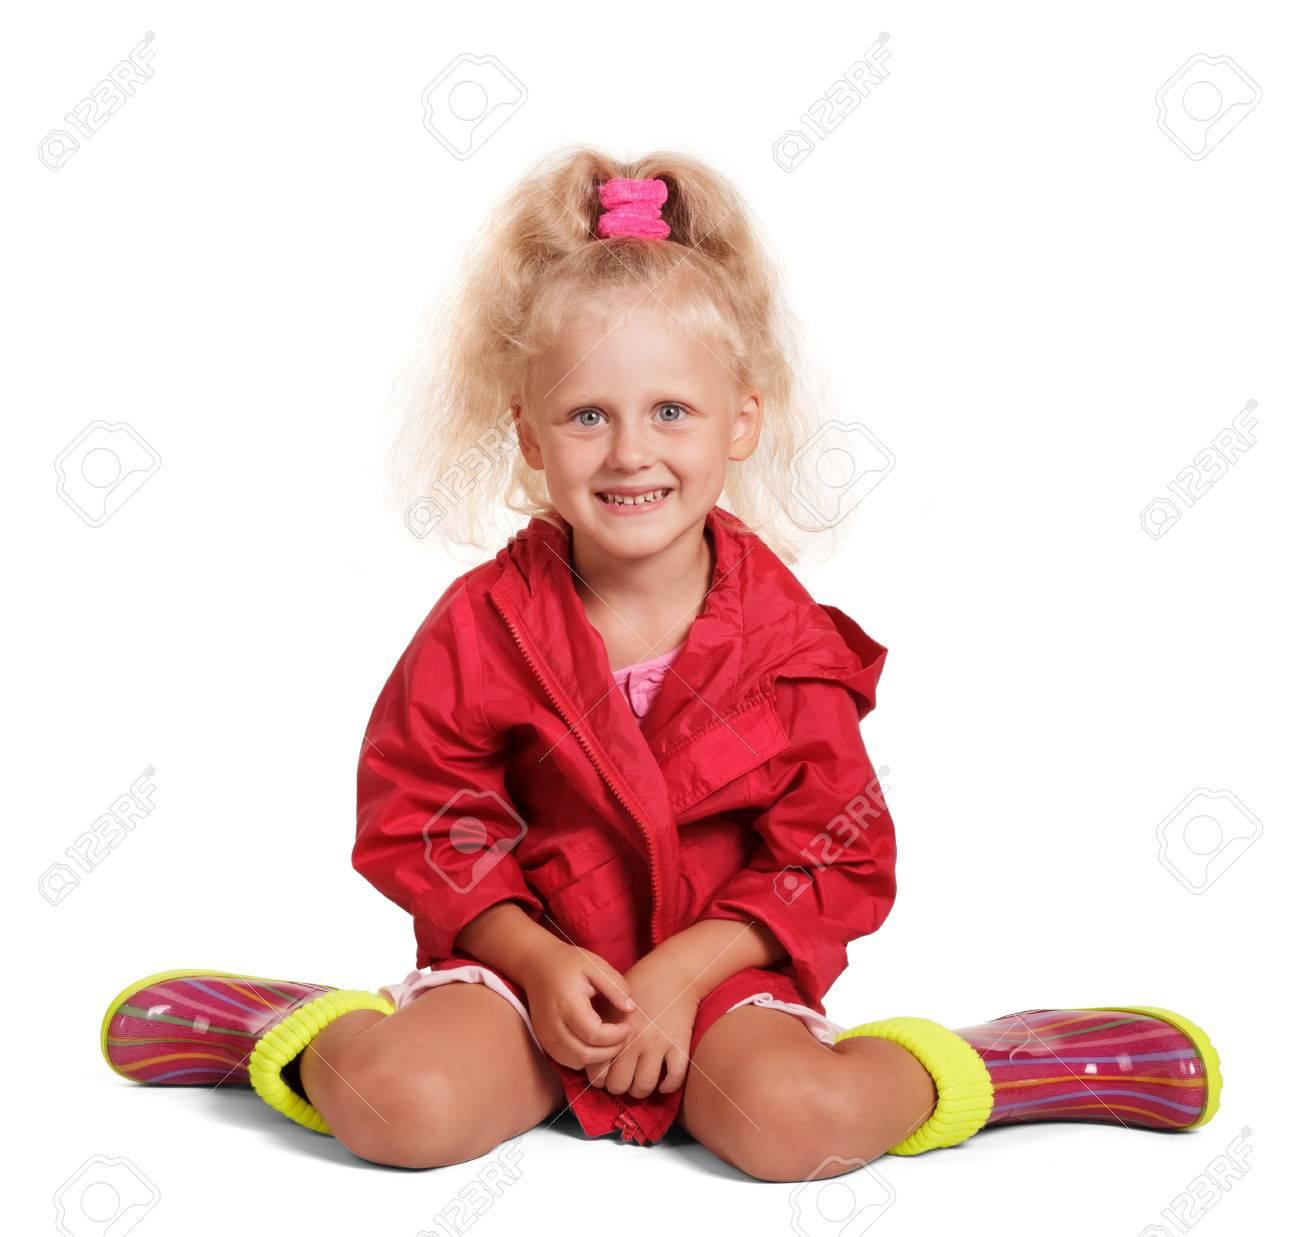 Veste rouge petite fille